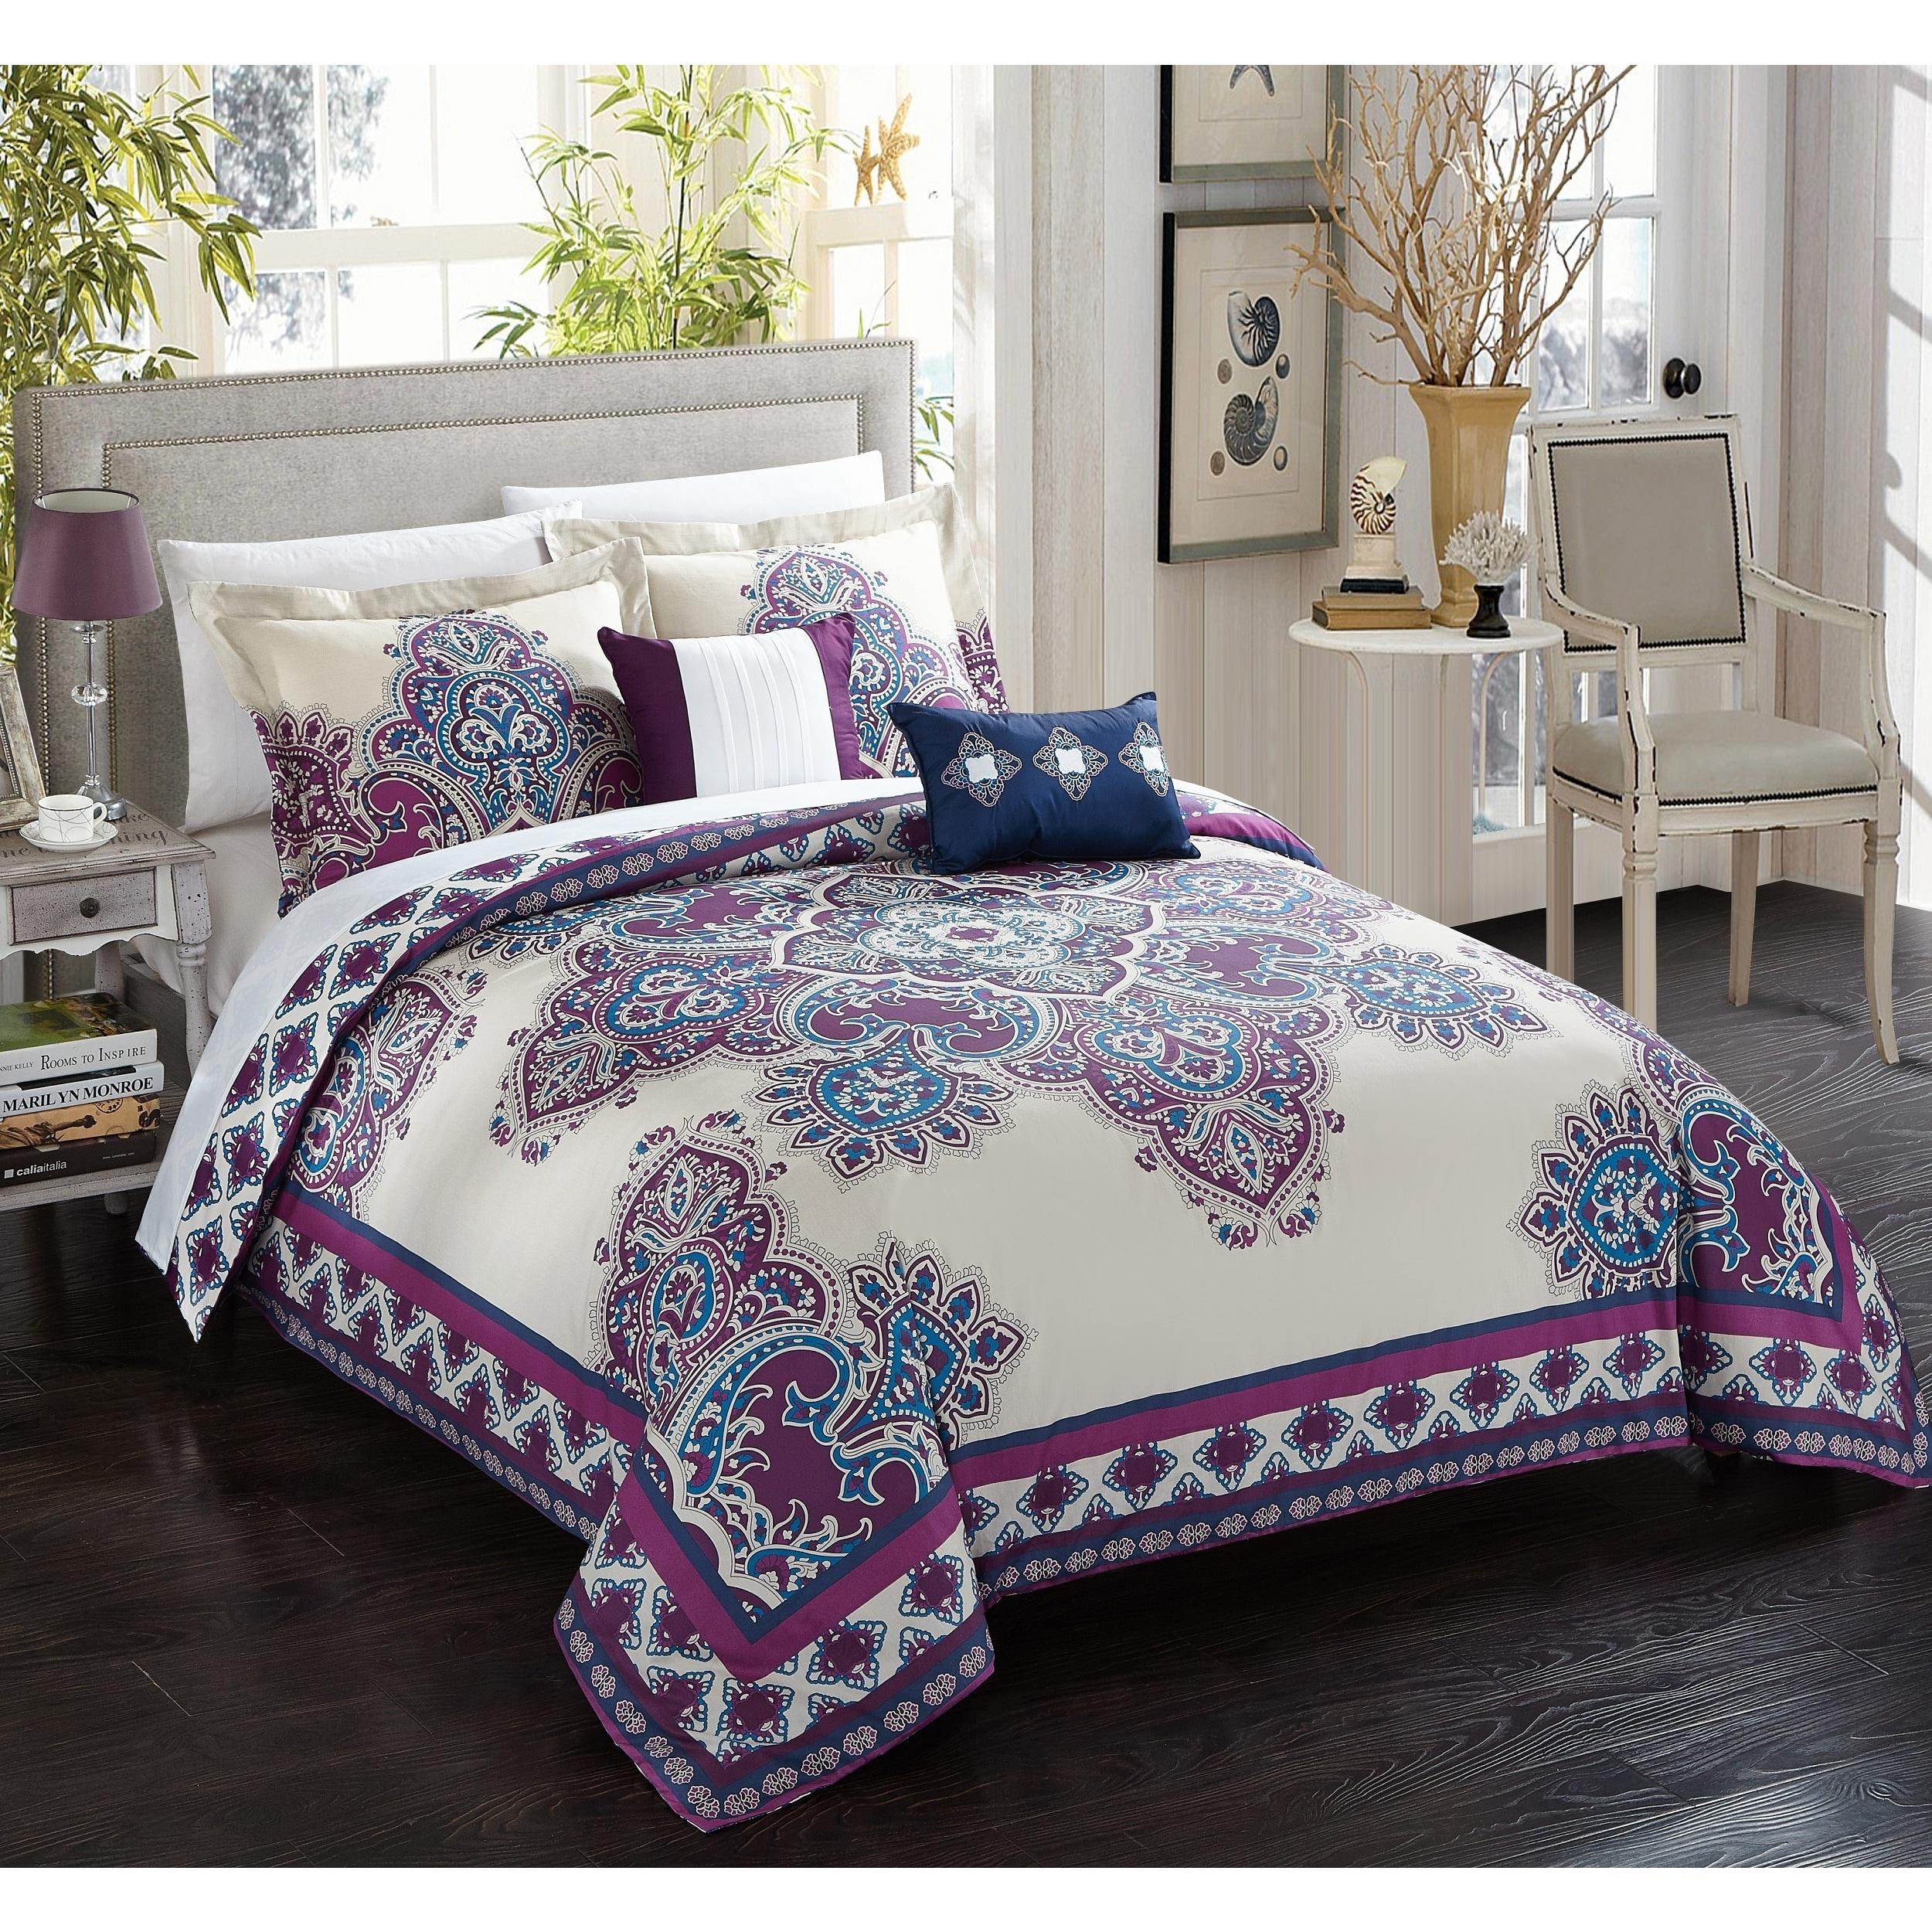 Chic Home 5 piece Sati Purple Cotton Reversible forter Set Free